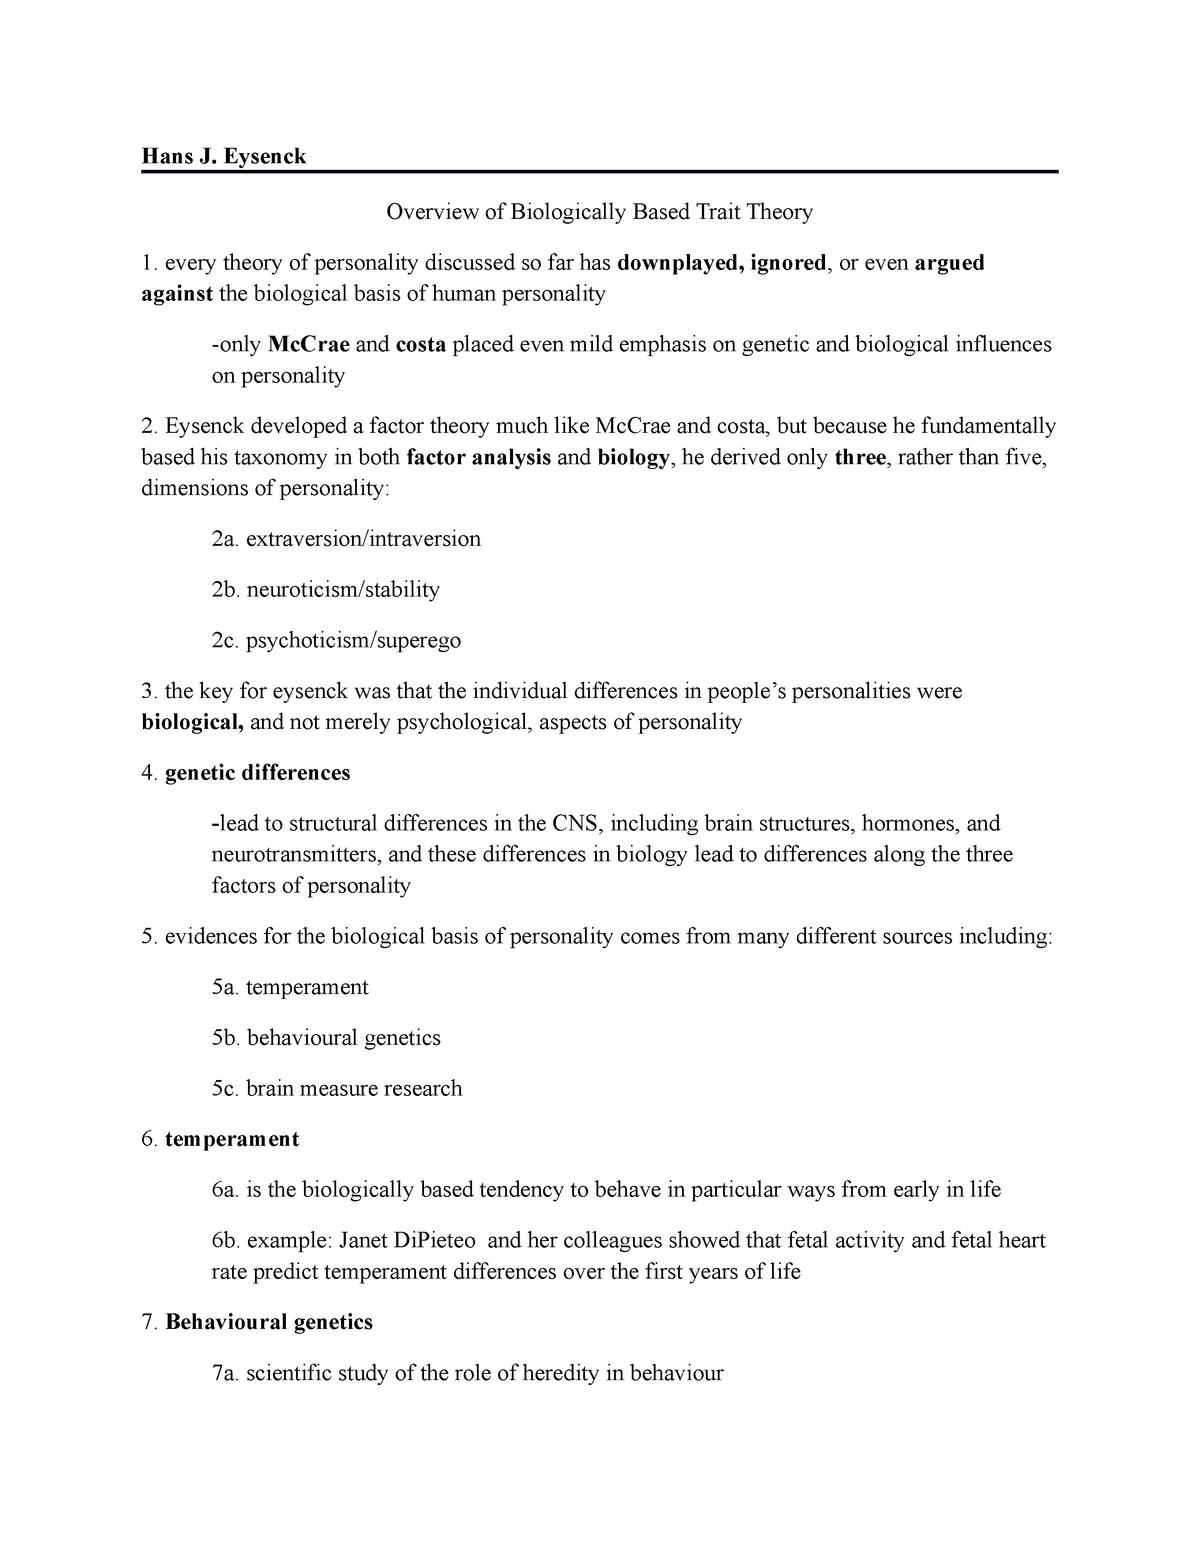 Hans J Eysenck (Theories of Personality by Feist) Summary - StuDocu